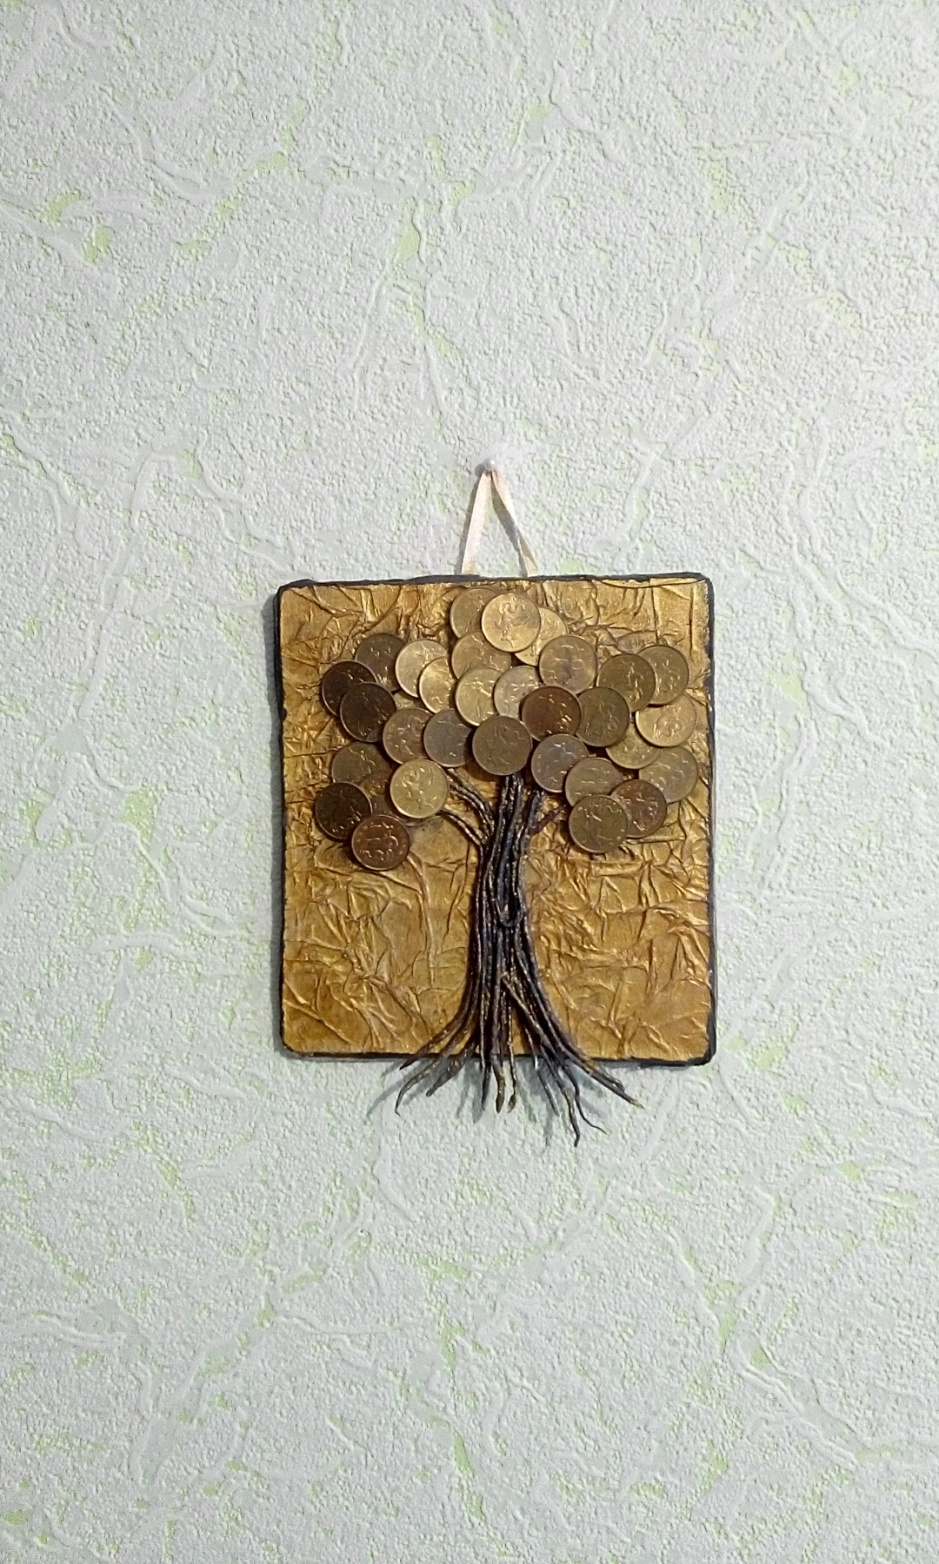 D:\ДЛЯ САЙТА\МК денежное дерево\IMG_20150928_165714.jpg